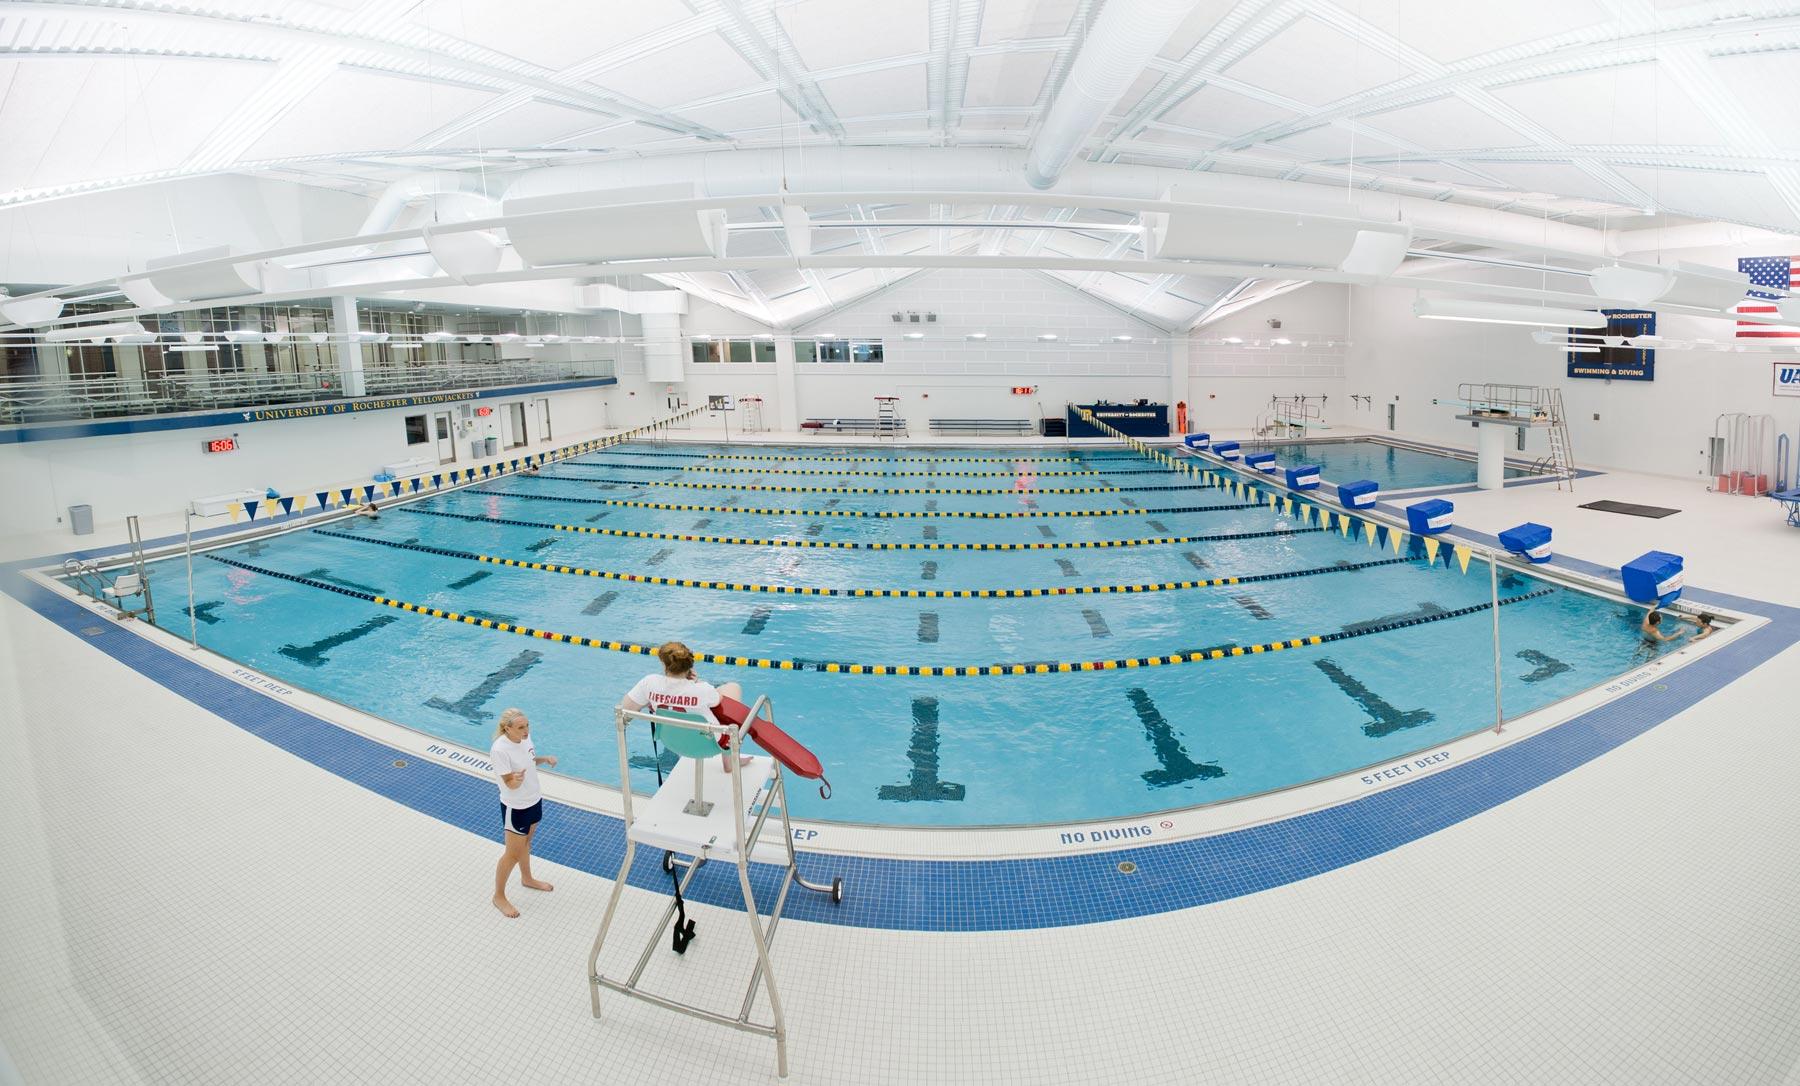 Speegle Wilbraham Aquatic Center Athletics And Recreation University Of Rochester